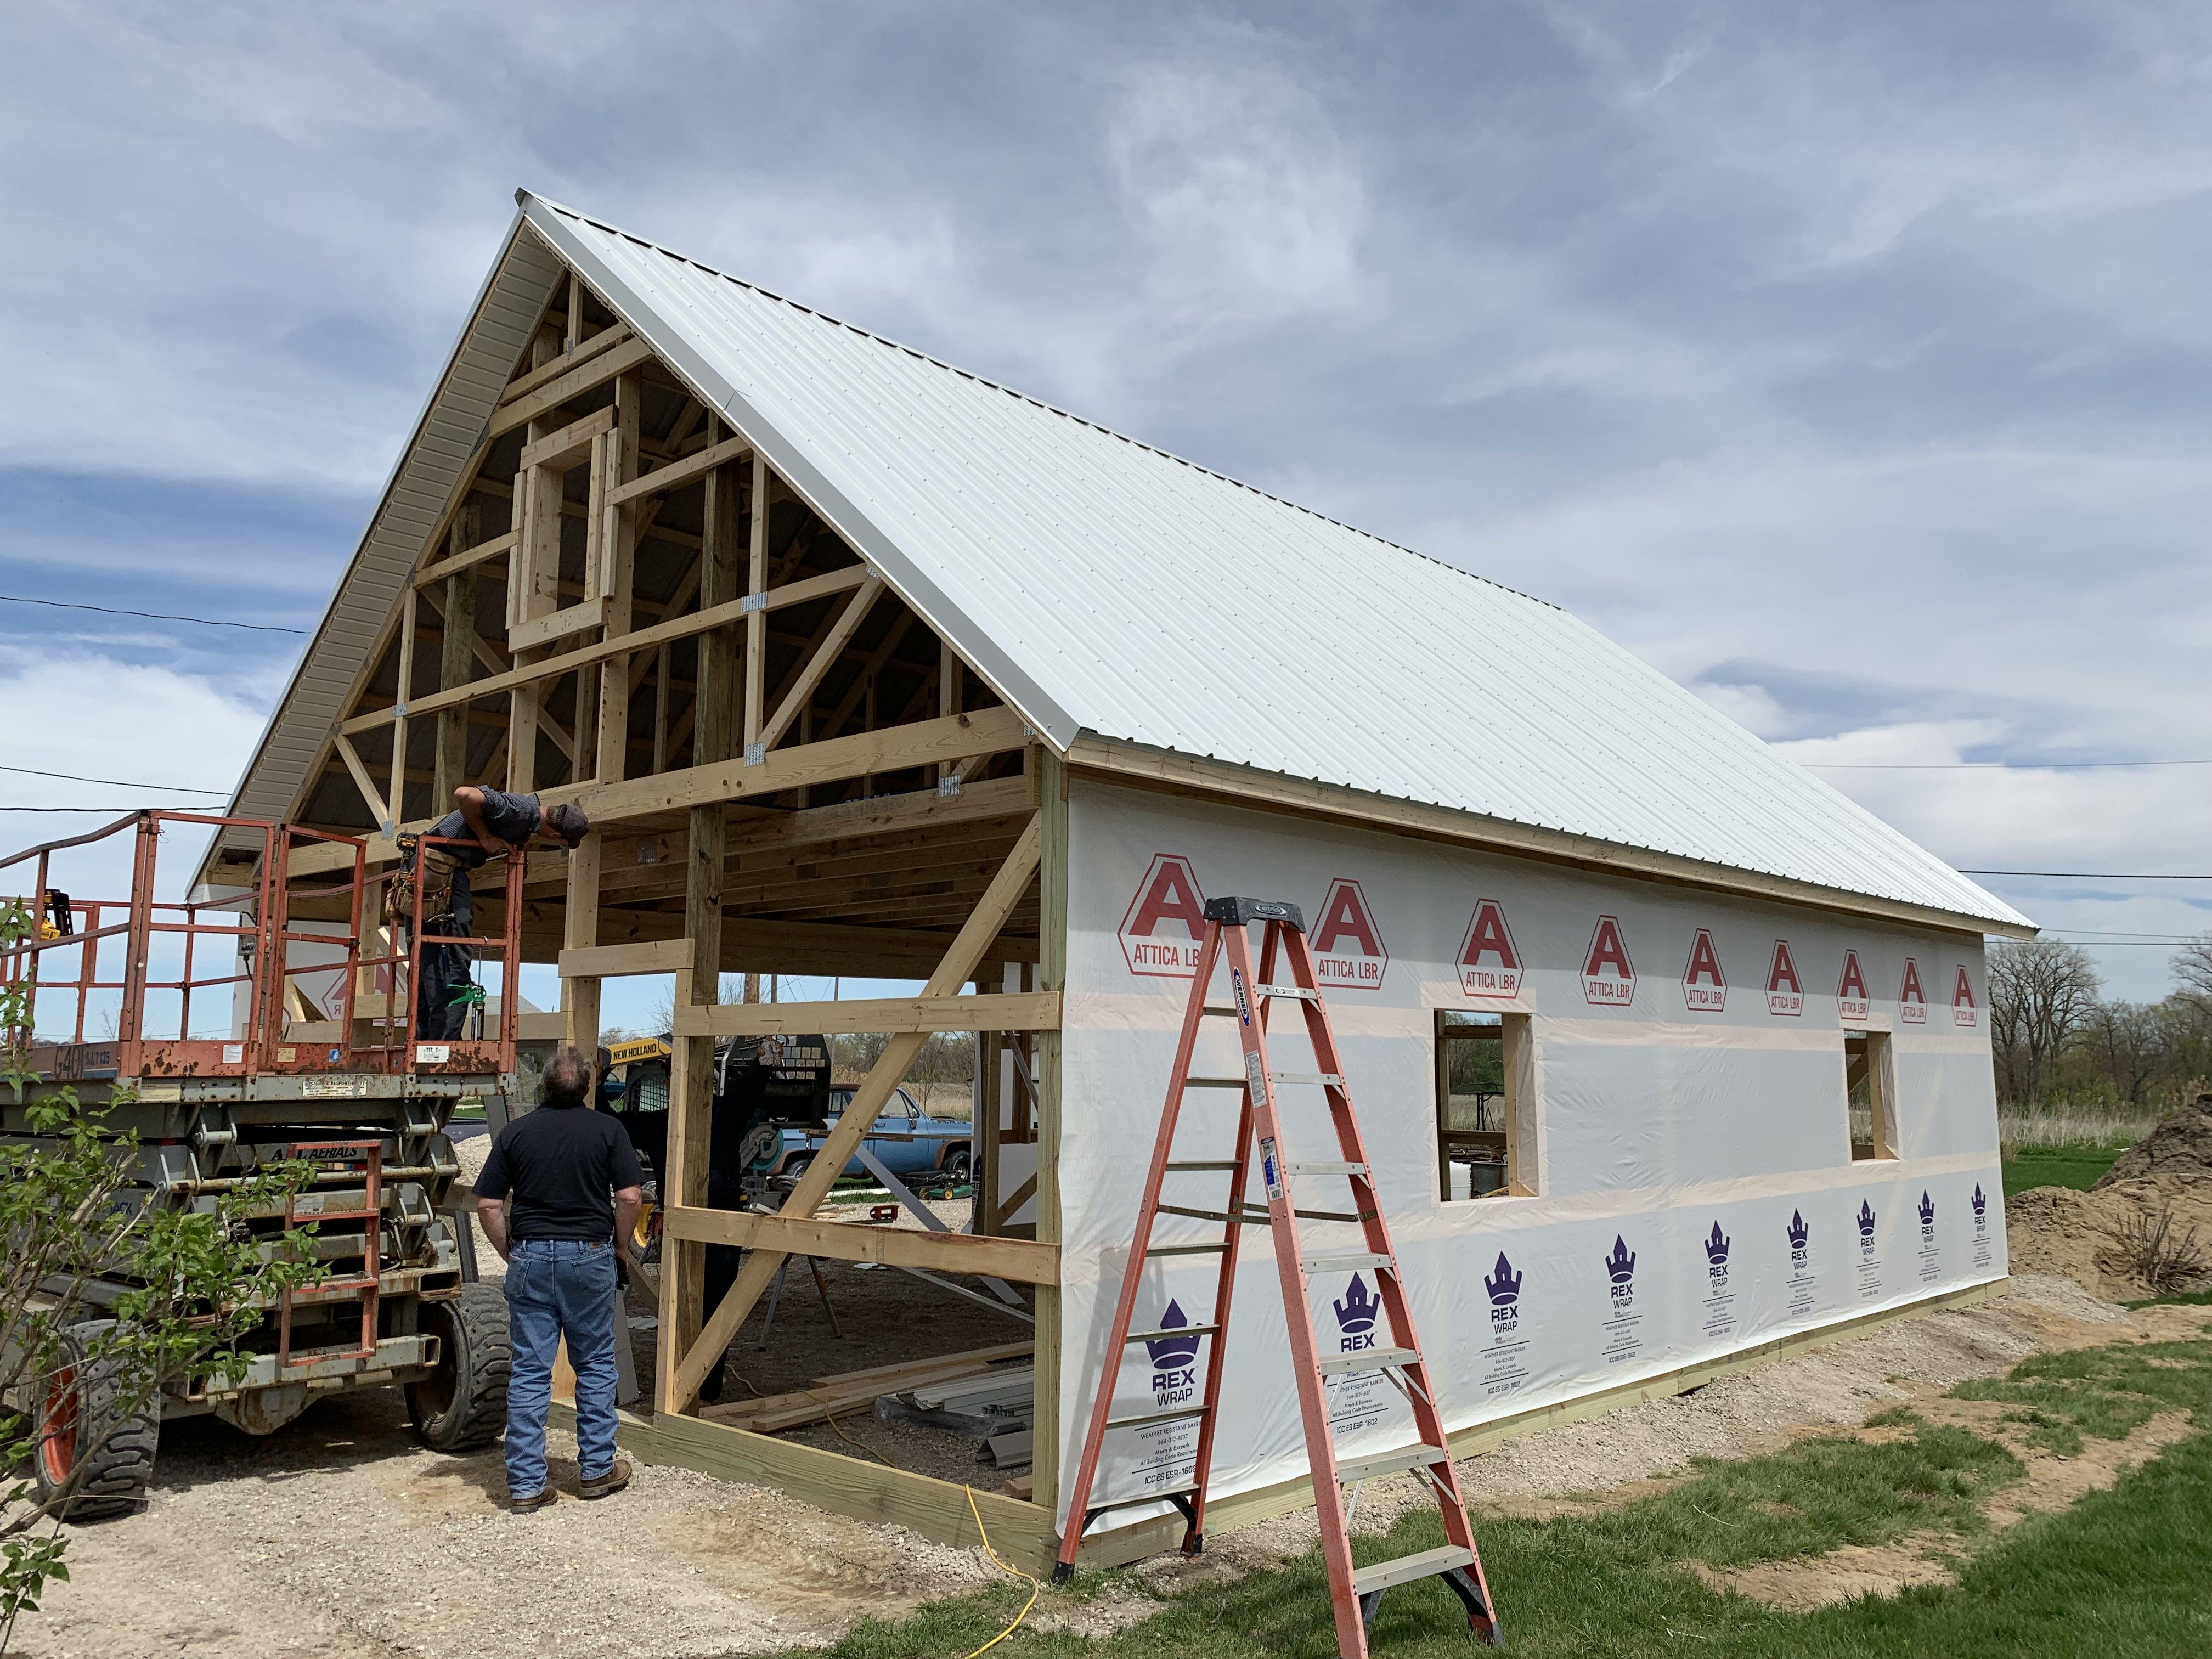 10 12 Pitch In Process Pole Barn Pole Barn Post Frame Building Pole Barn Garage